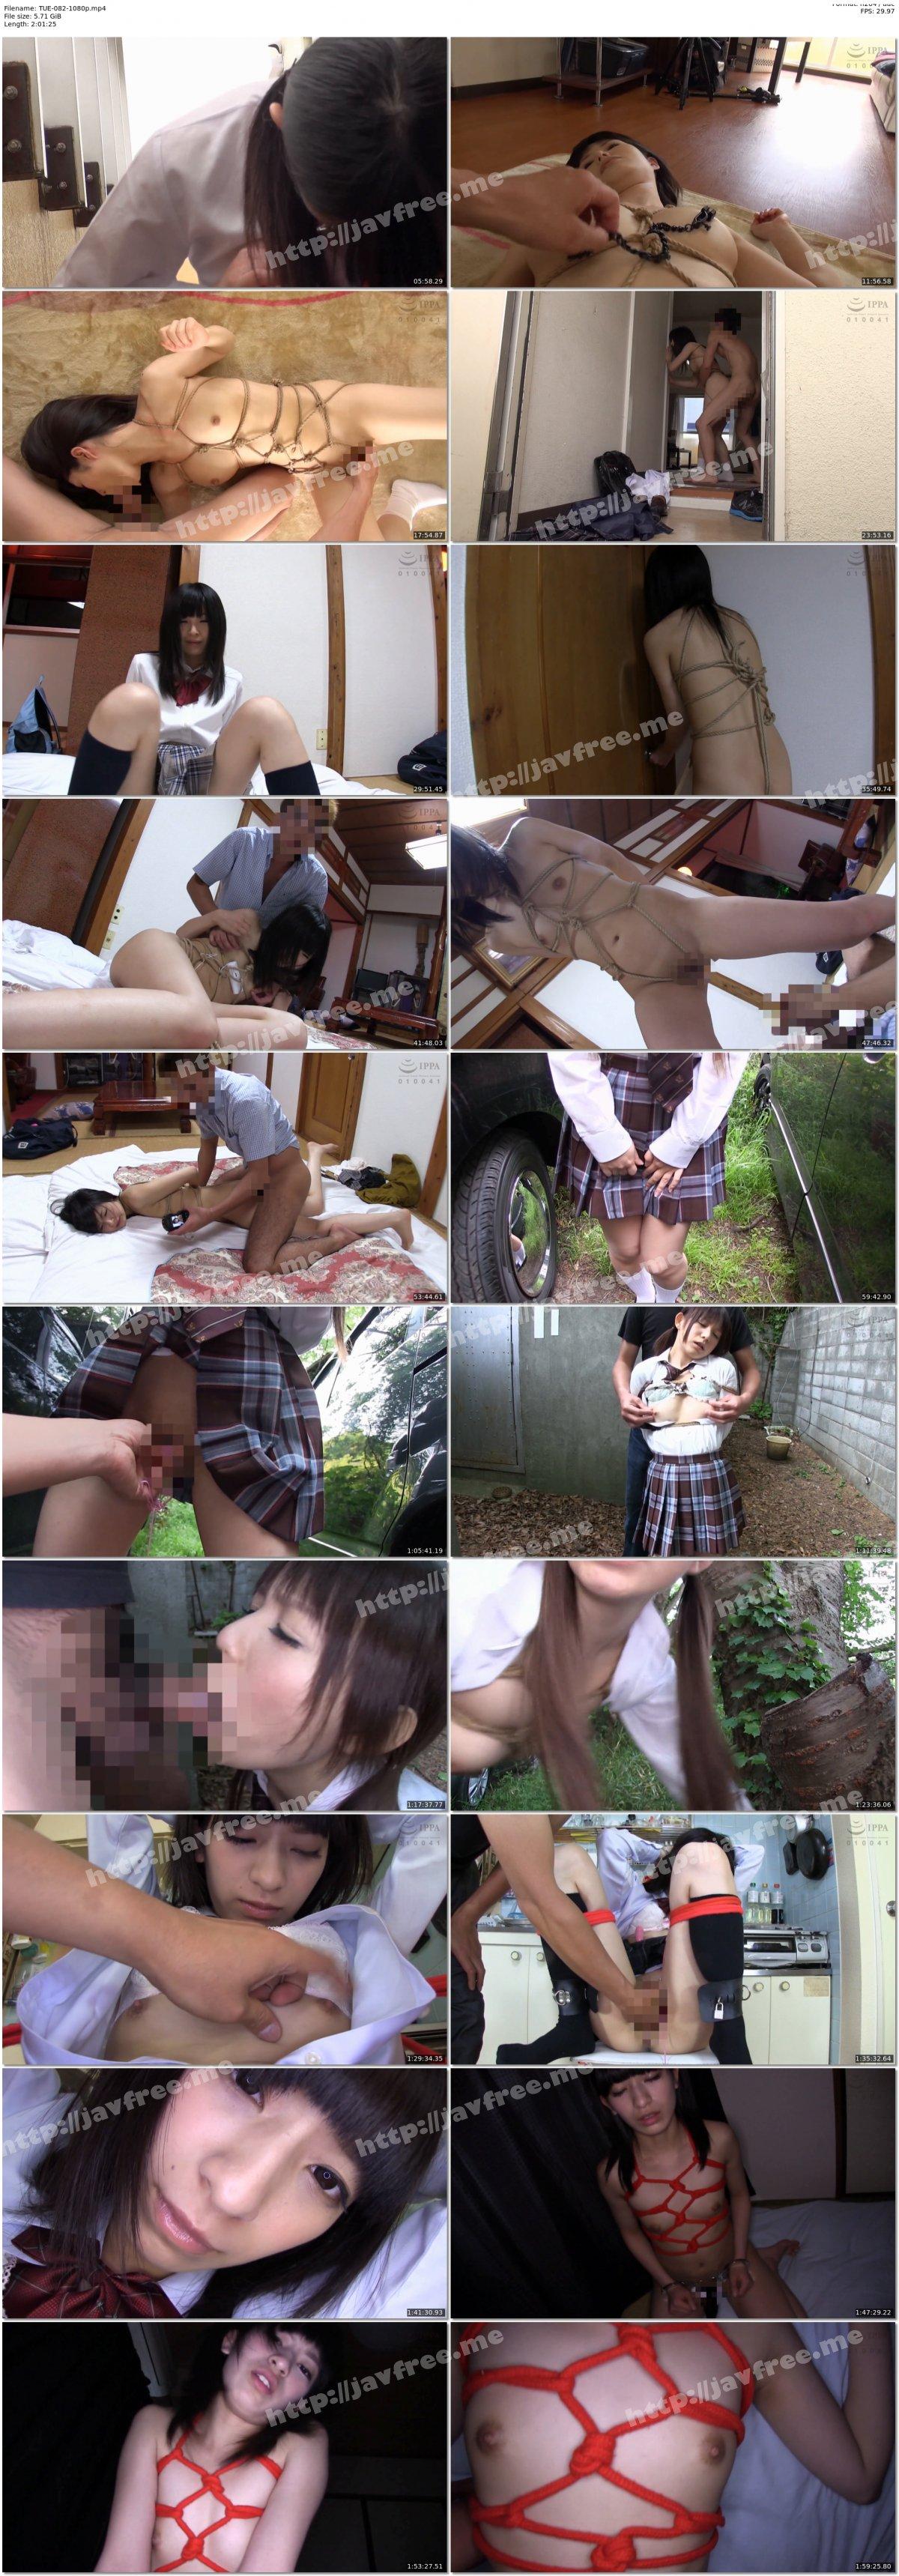 [HD][TUE-082] 女子●生緊縛調教投稿映像 - image TUE-082-1080p on https://javfree.me